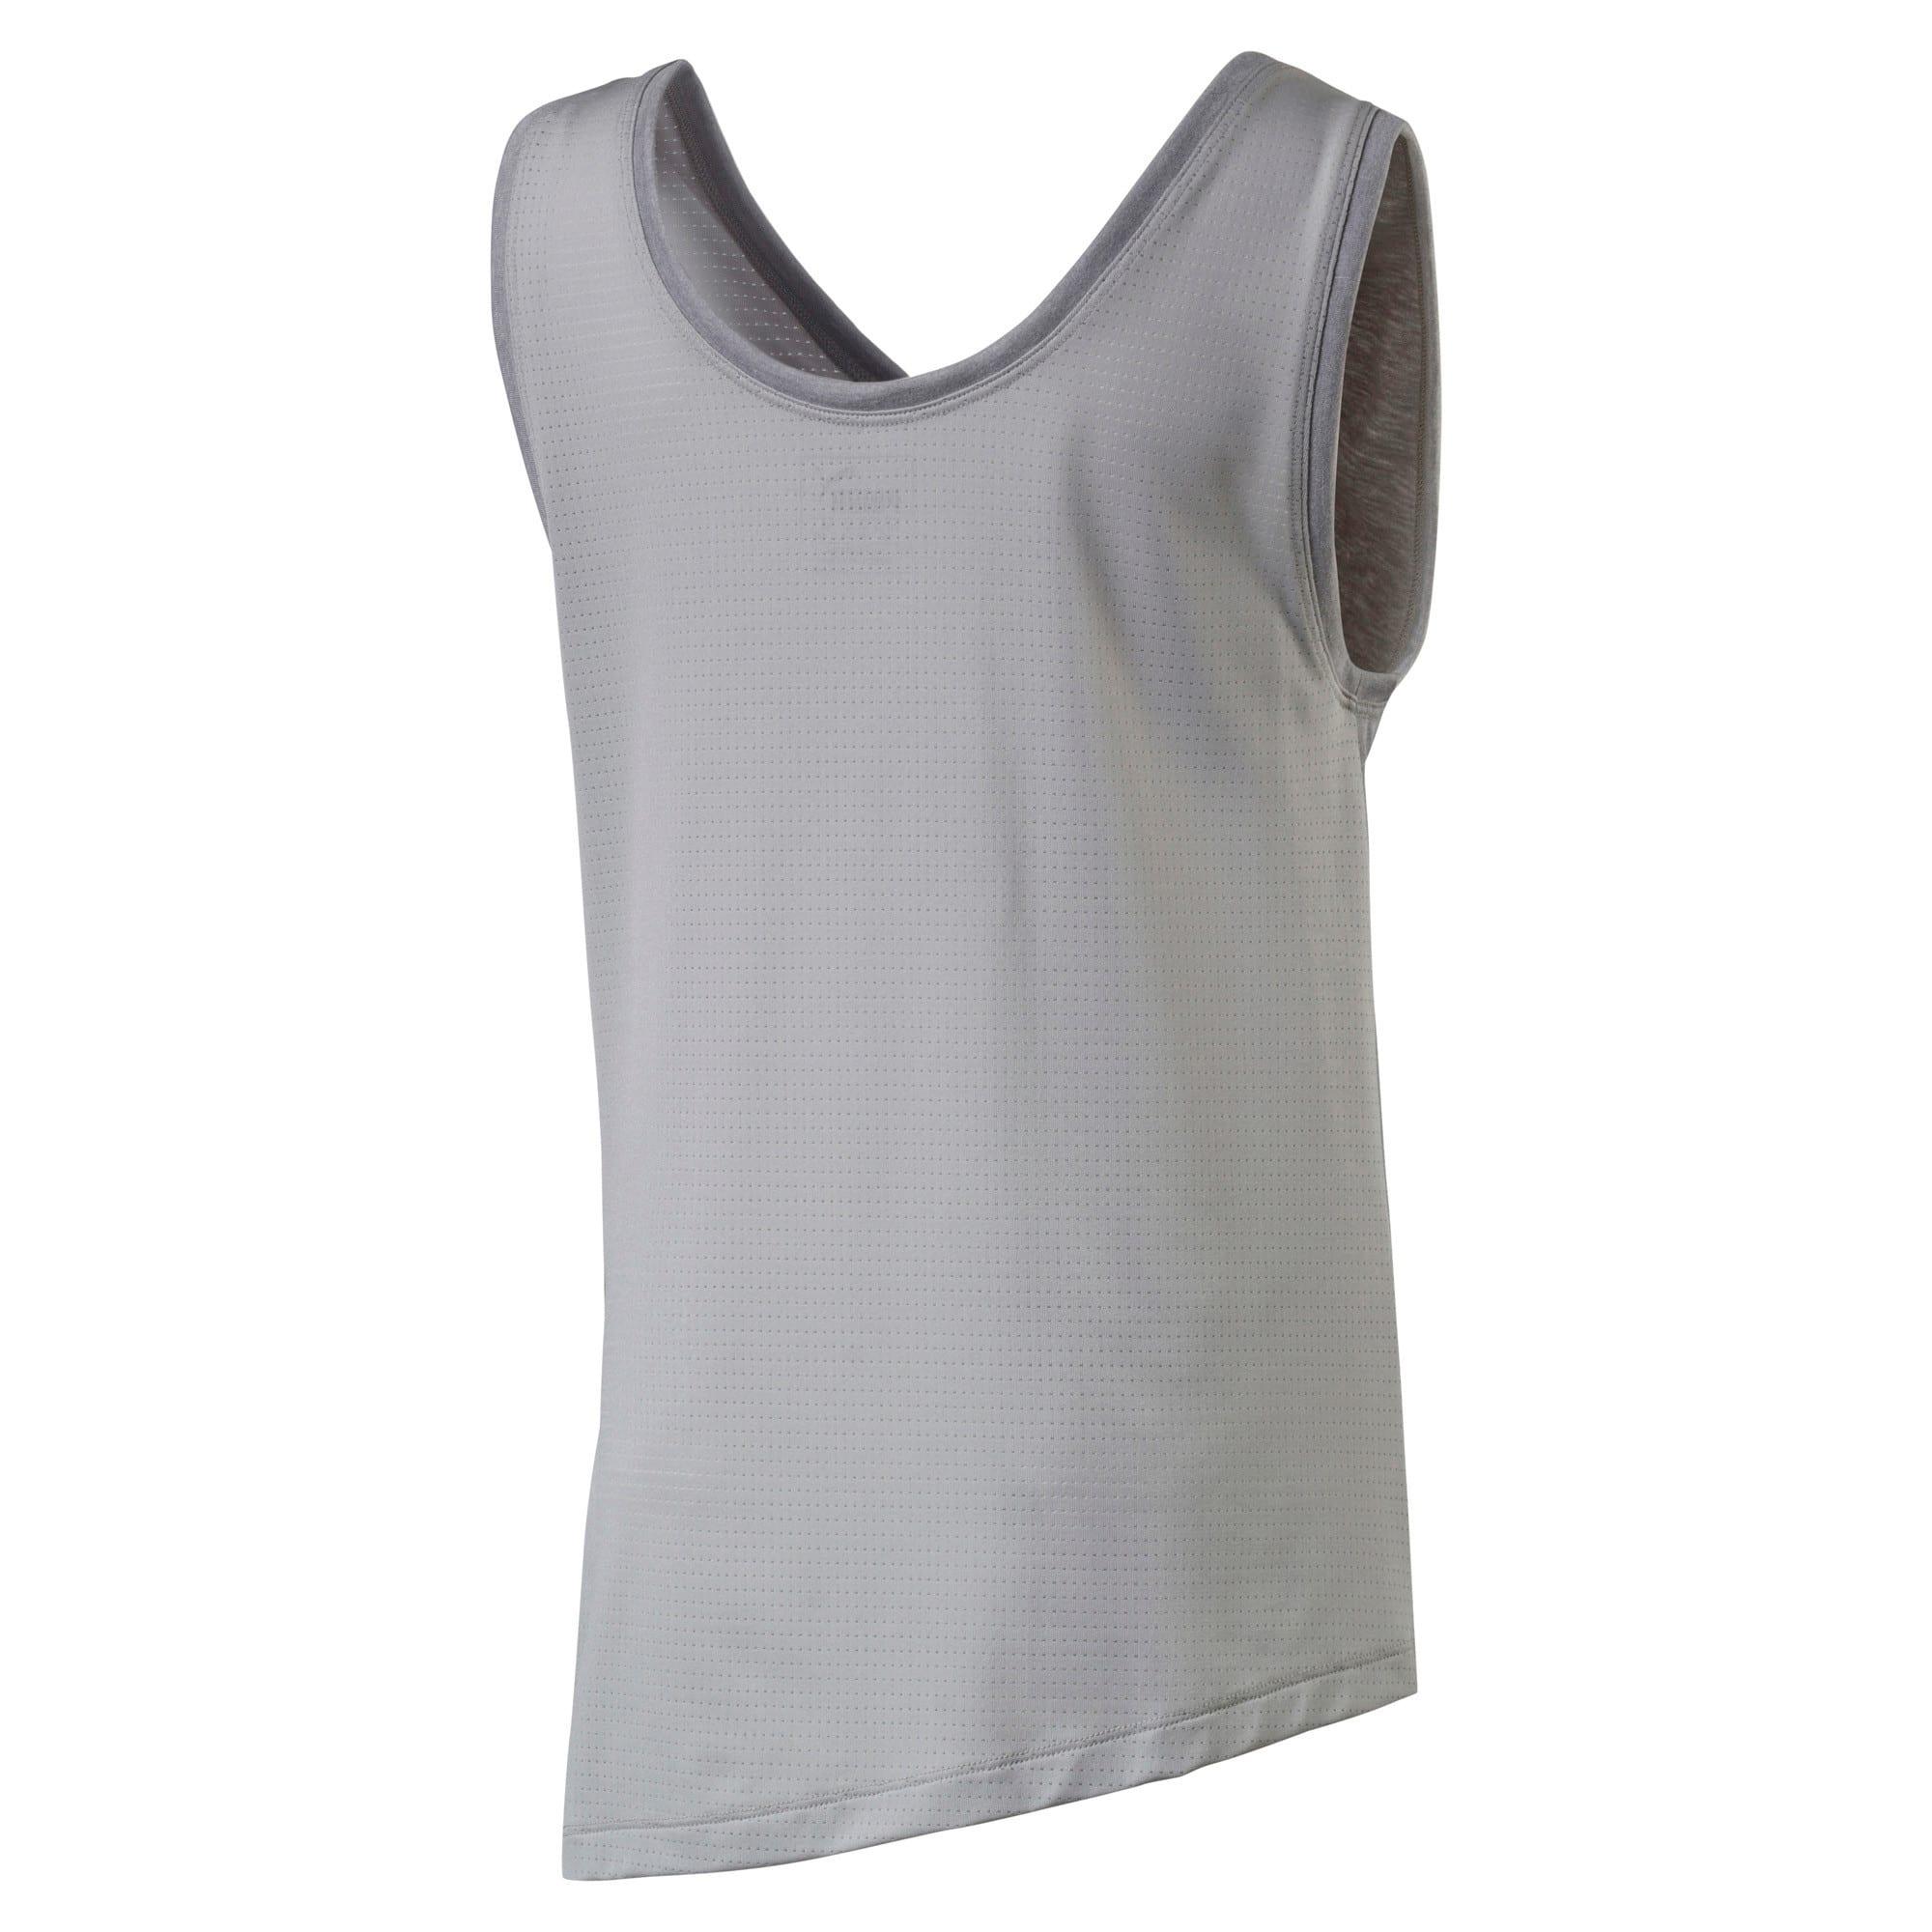 Thumbnail 2 of Softsport Girls' Sleeveless Training Top, Light Gray Heather, medium-IND